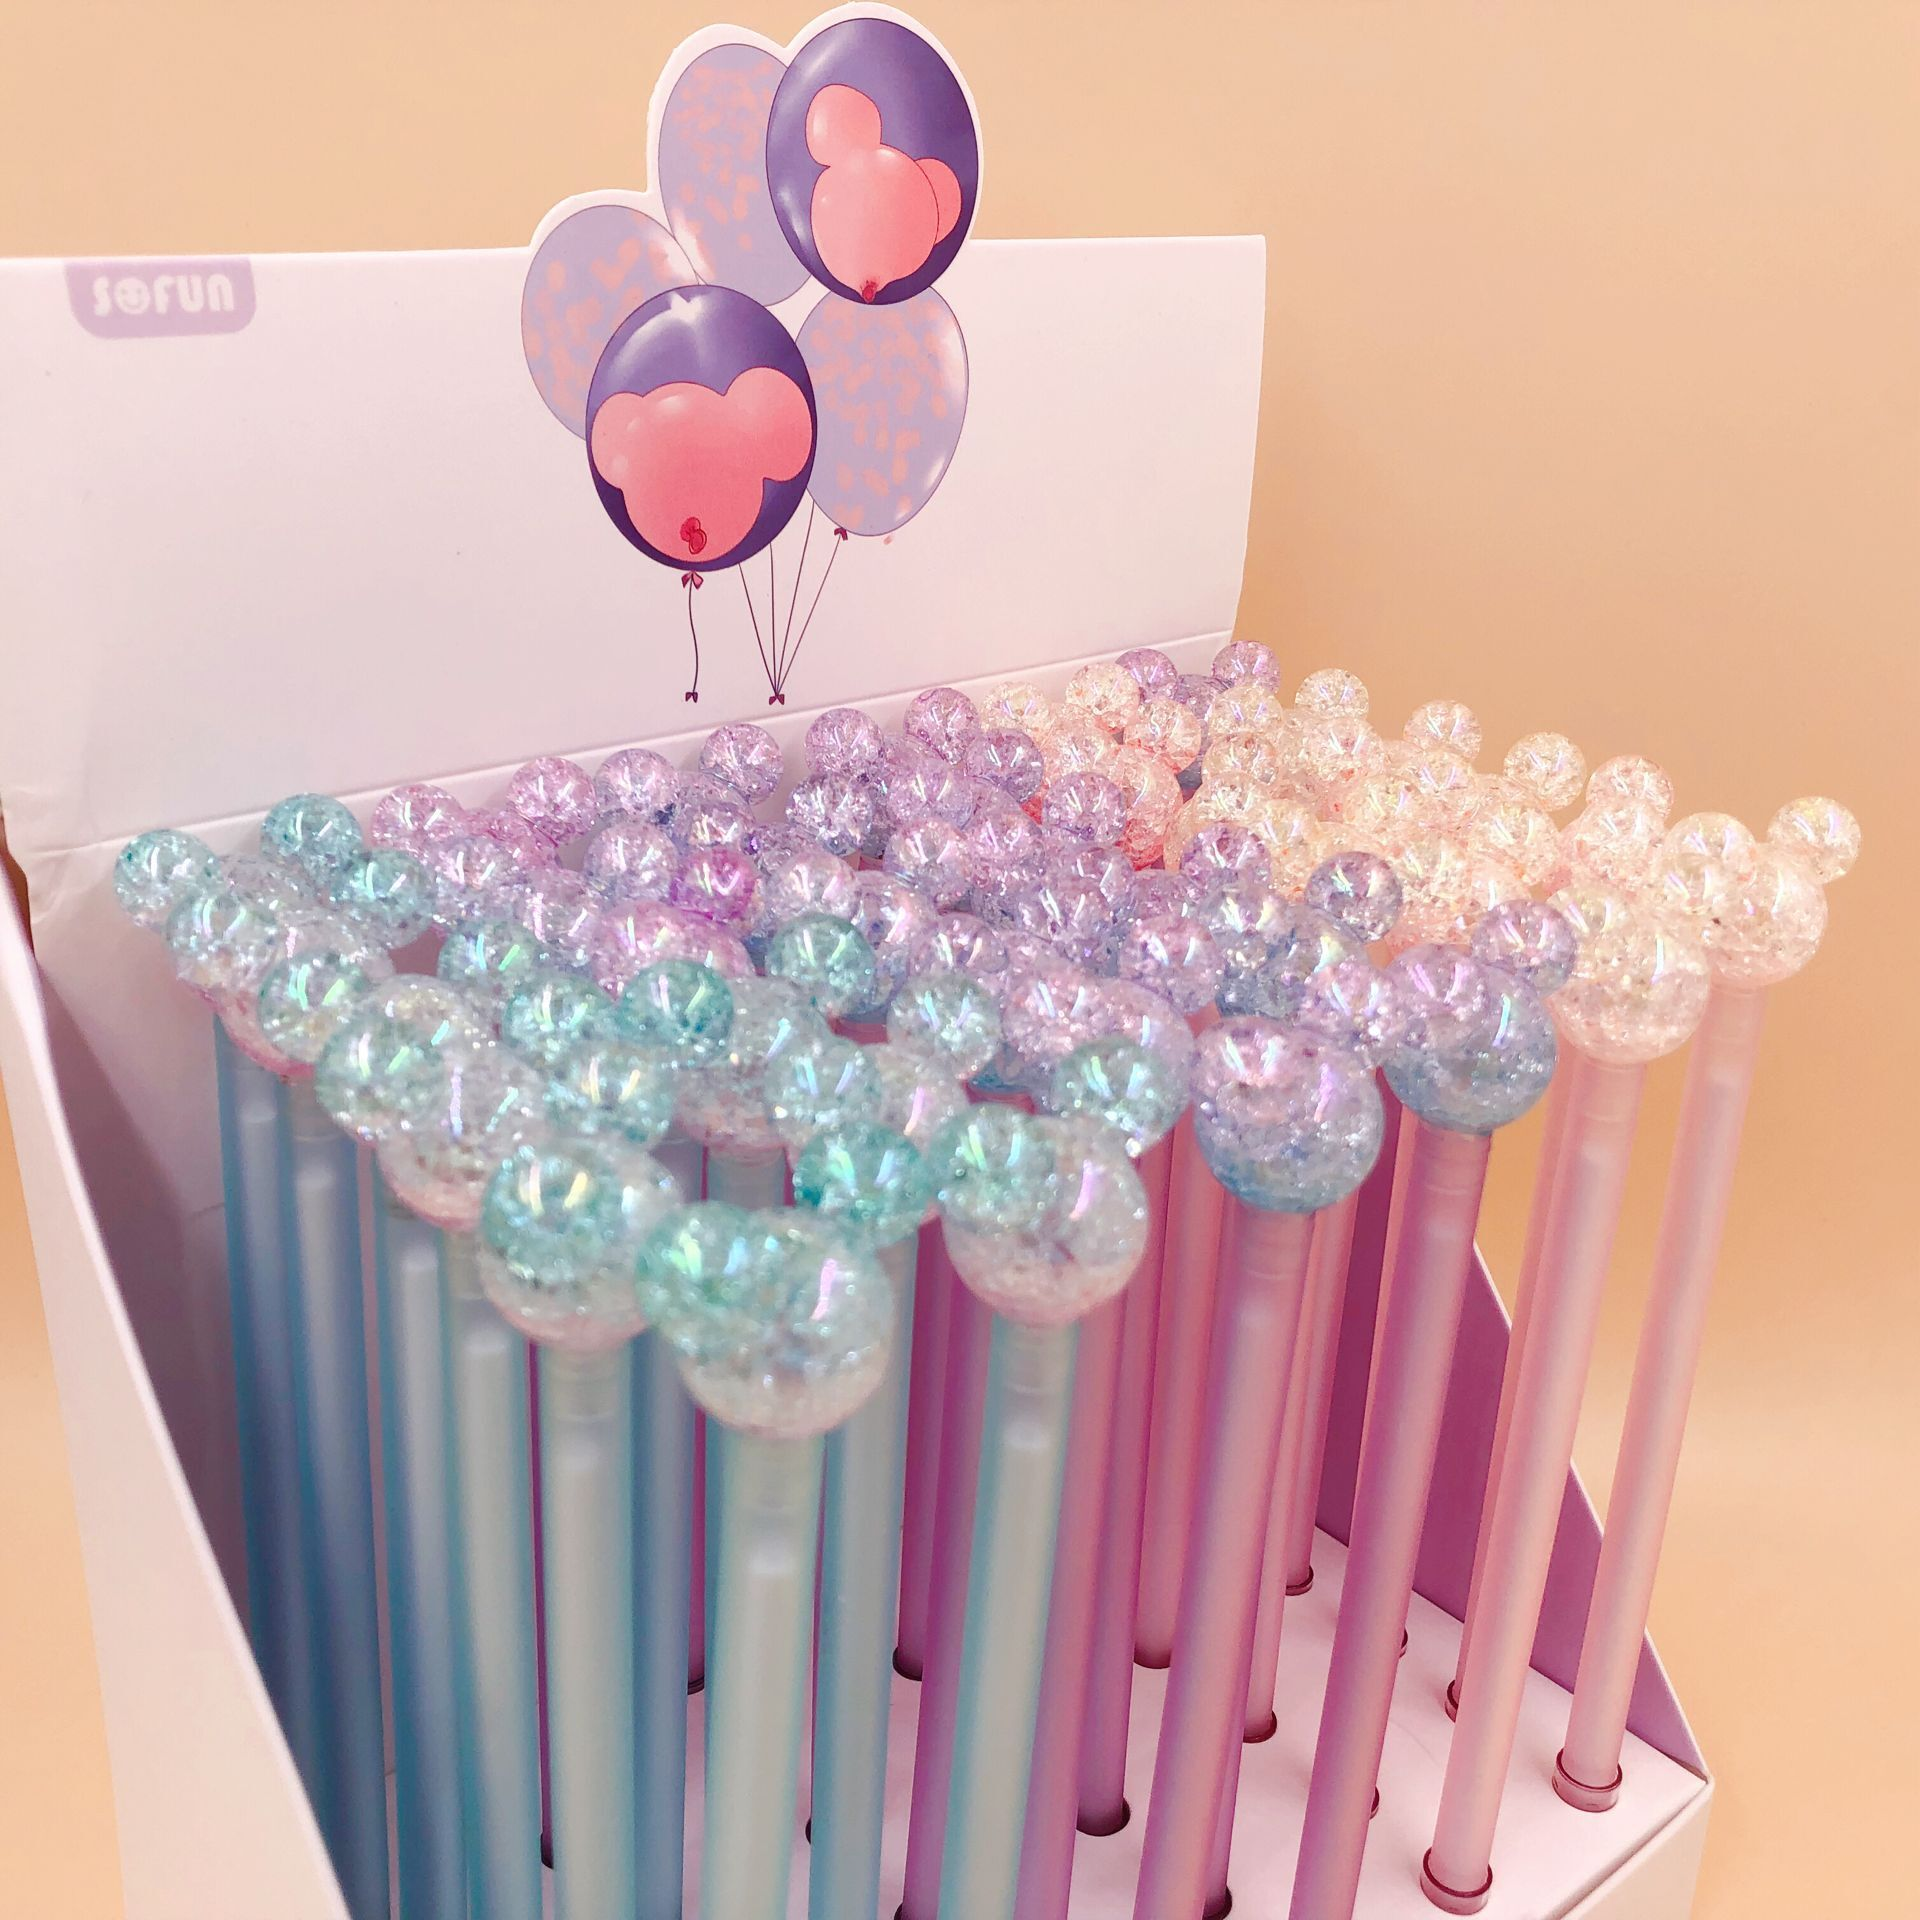 36pcs Disney Mickey Korean Creative Cartoon Gel Pen Black Ink Color Crystal Dali Gel Gel Pen Office Student Writing Gift